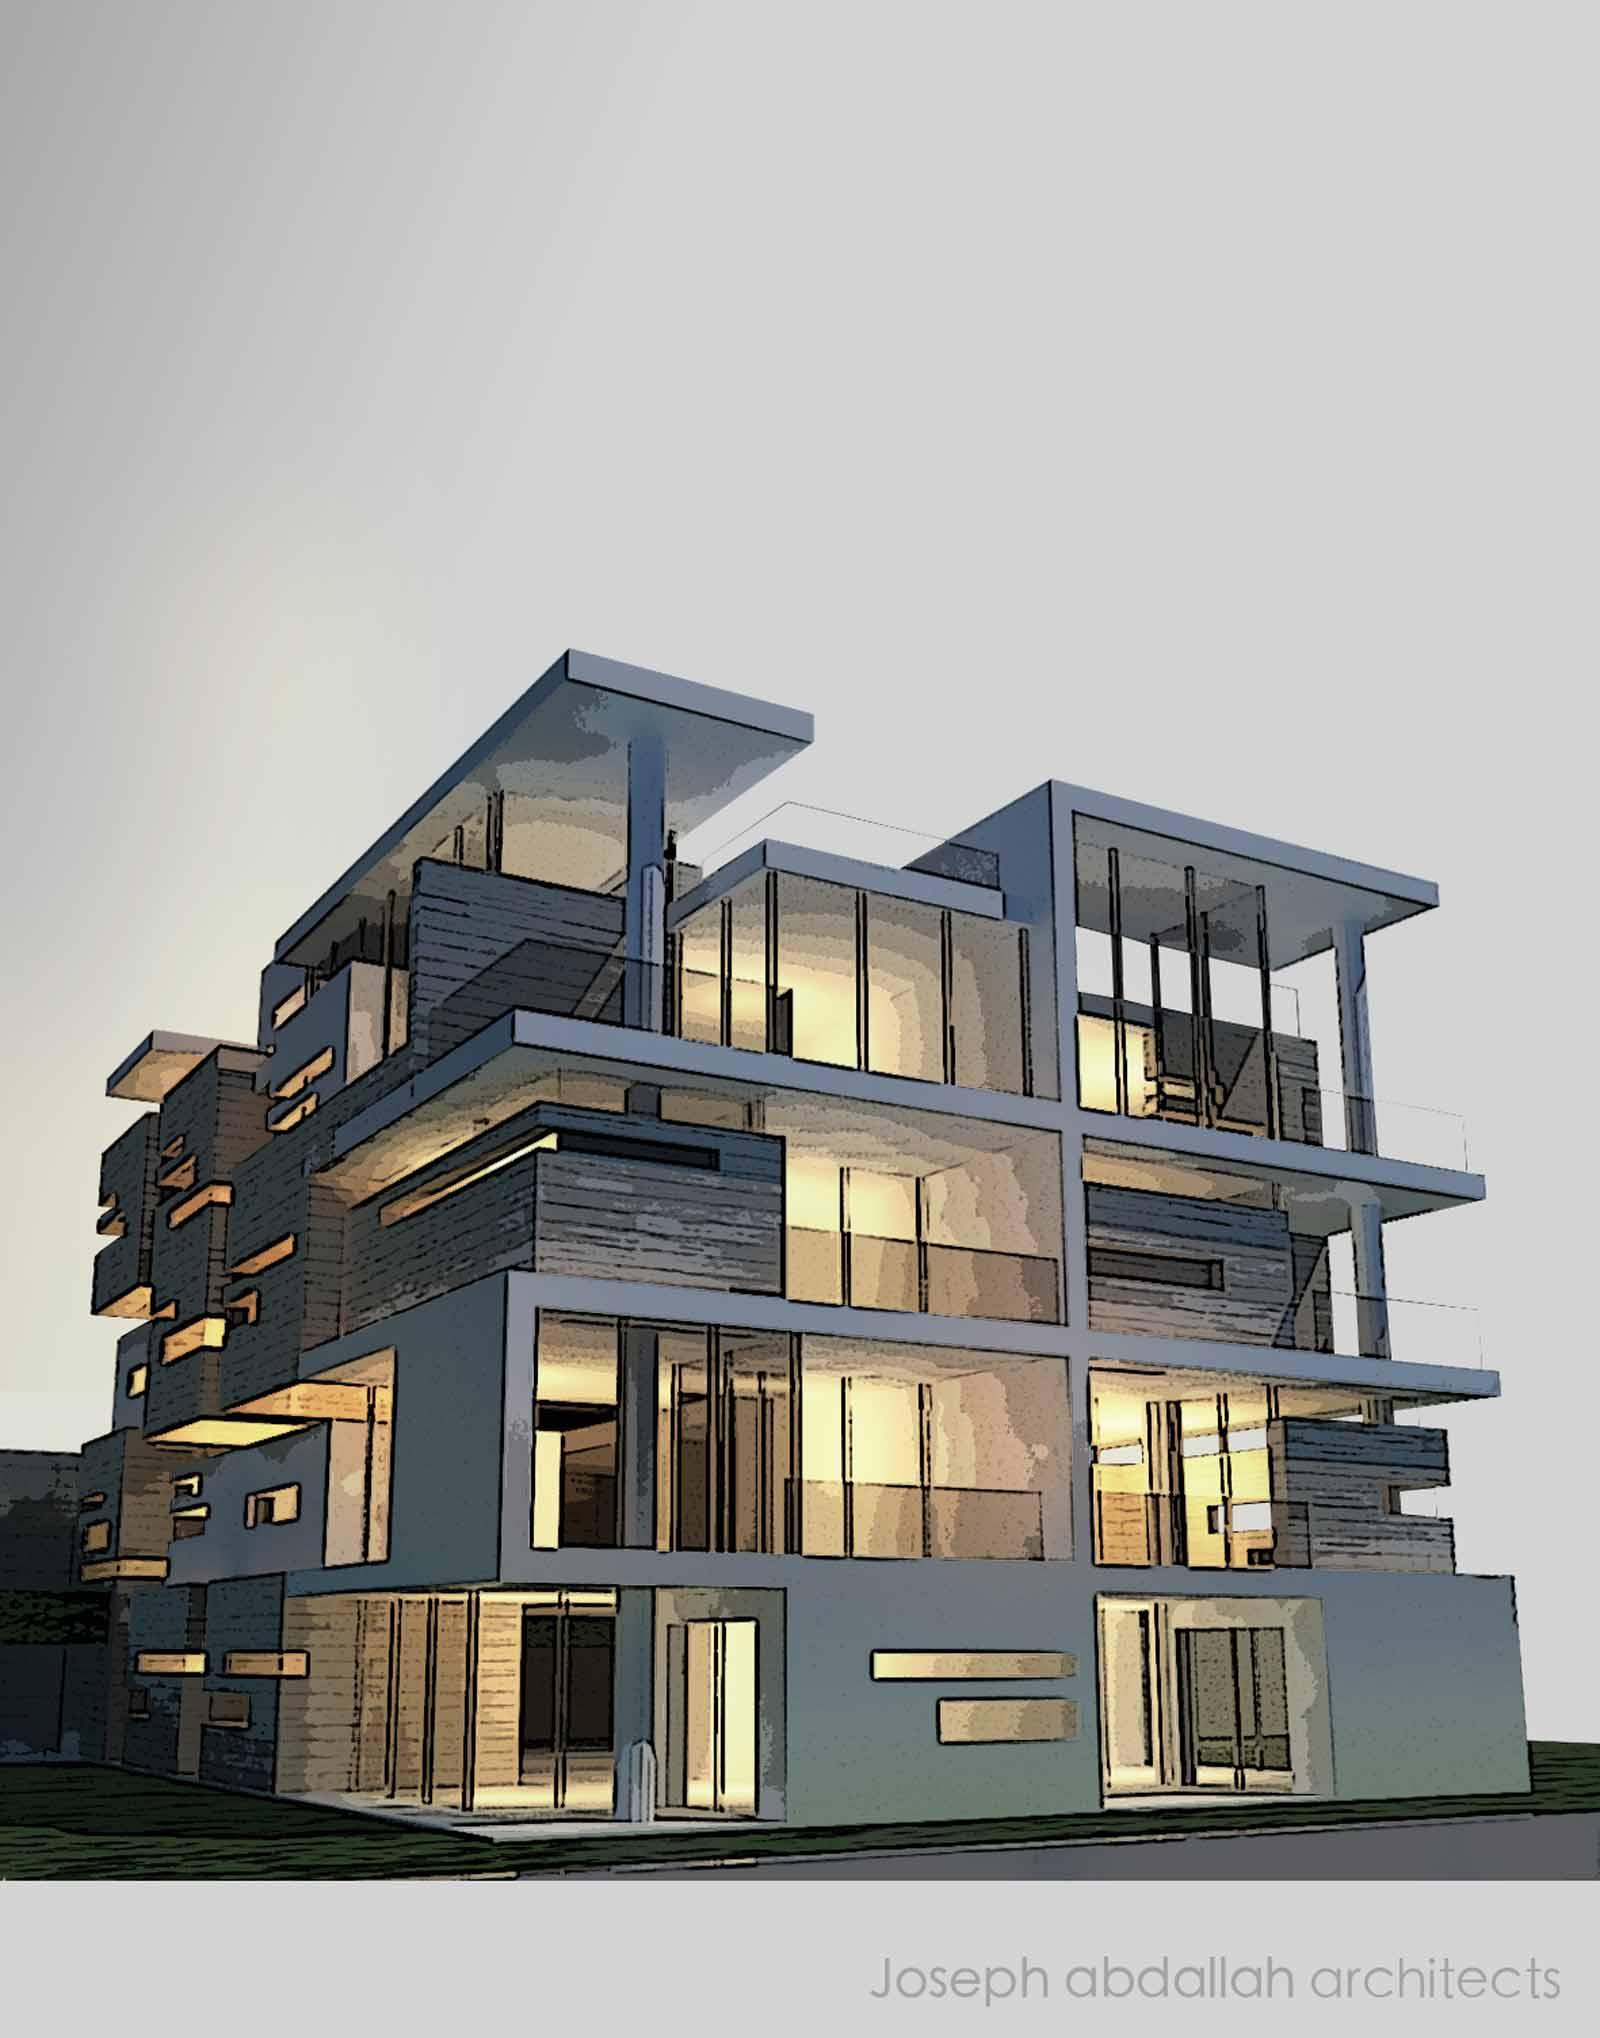 residence-building-modern-architecture-lebanon-joseph-abdallah-architects-3